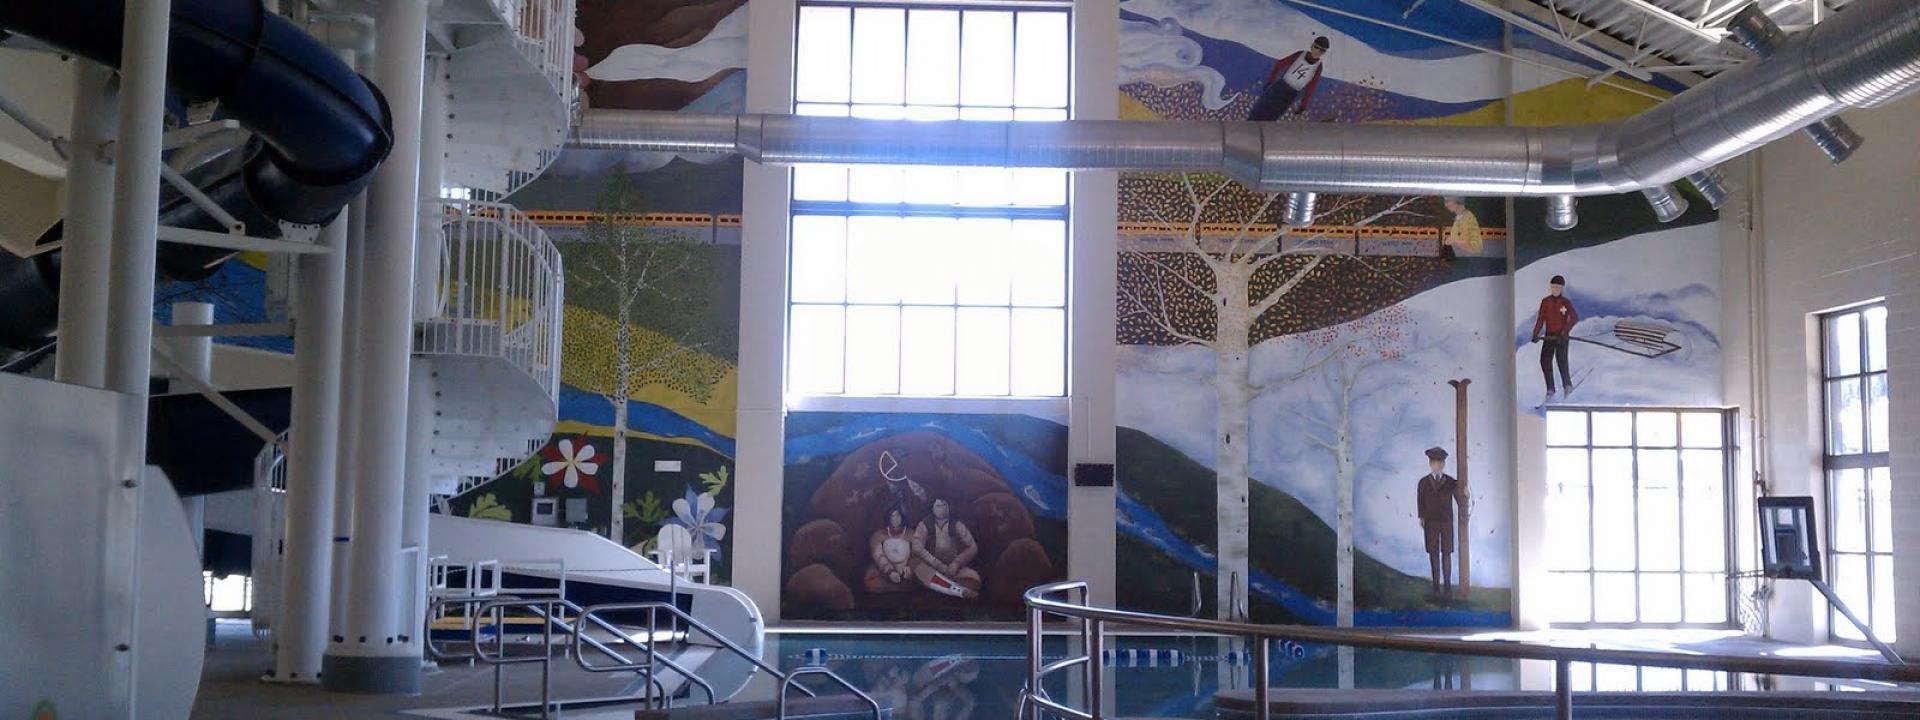 Grand Park Community Recreation Center - Indoor fun in Winter Park, Colorado